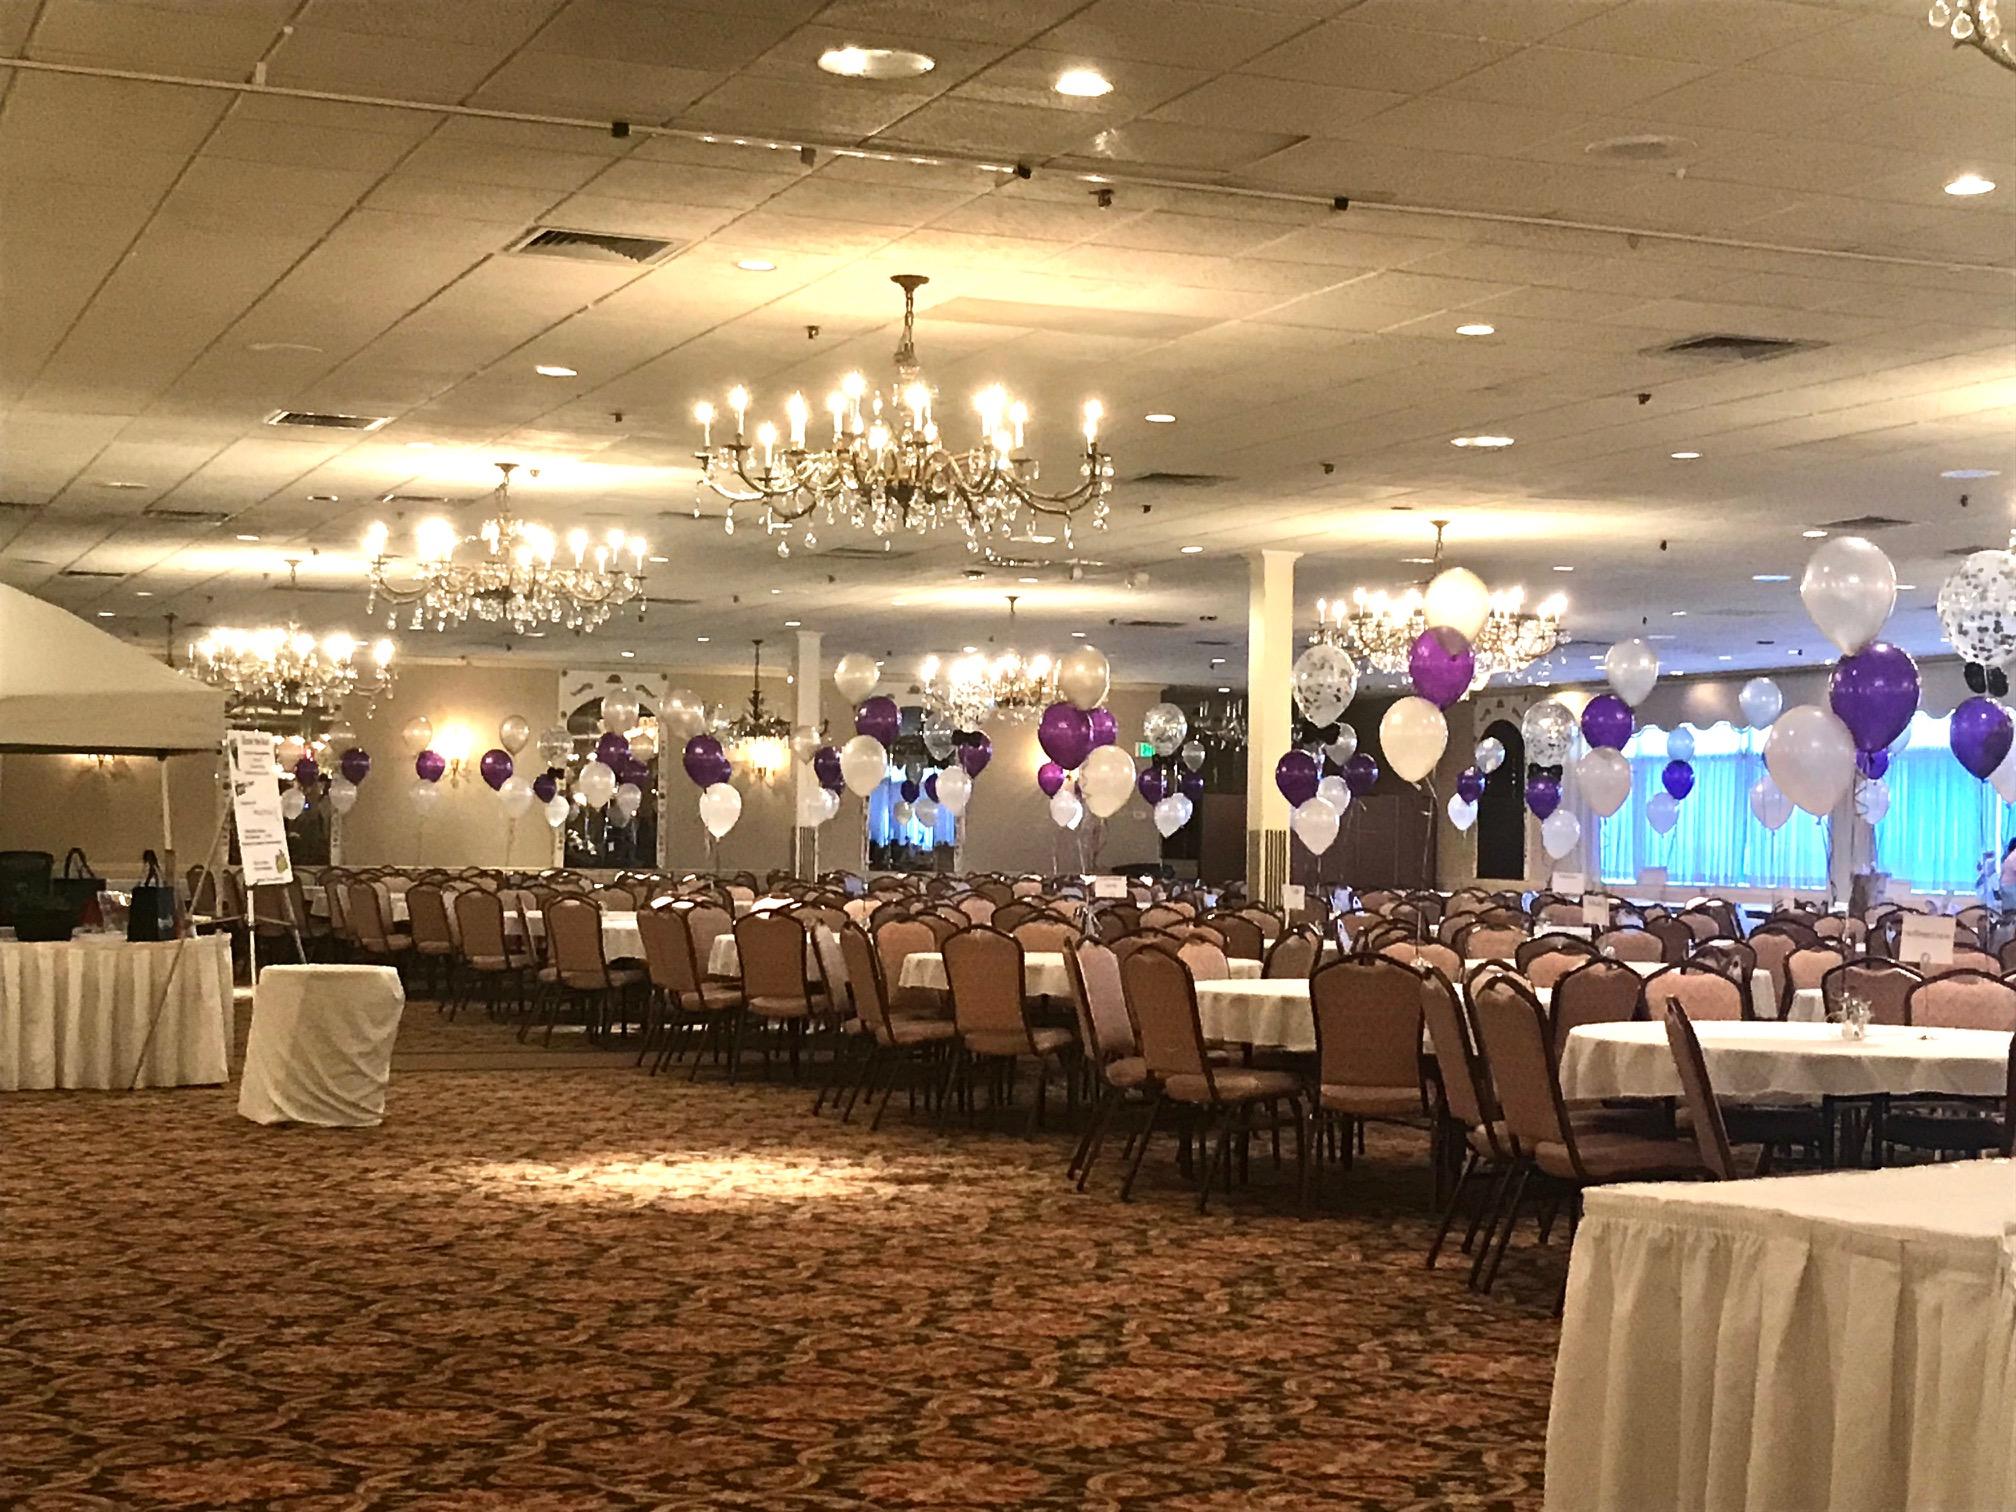 banquet helium balloon decorations